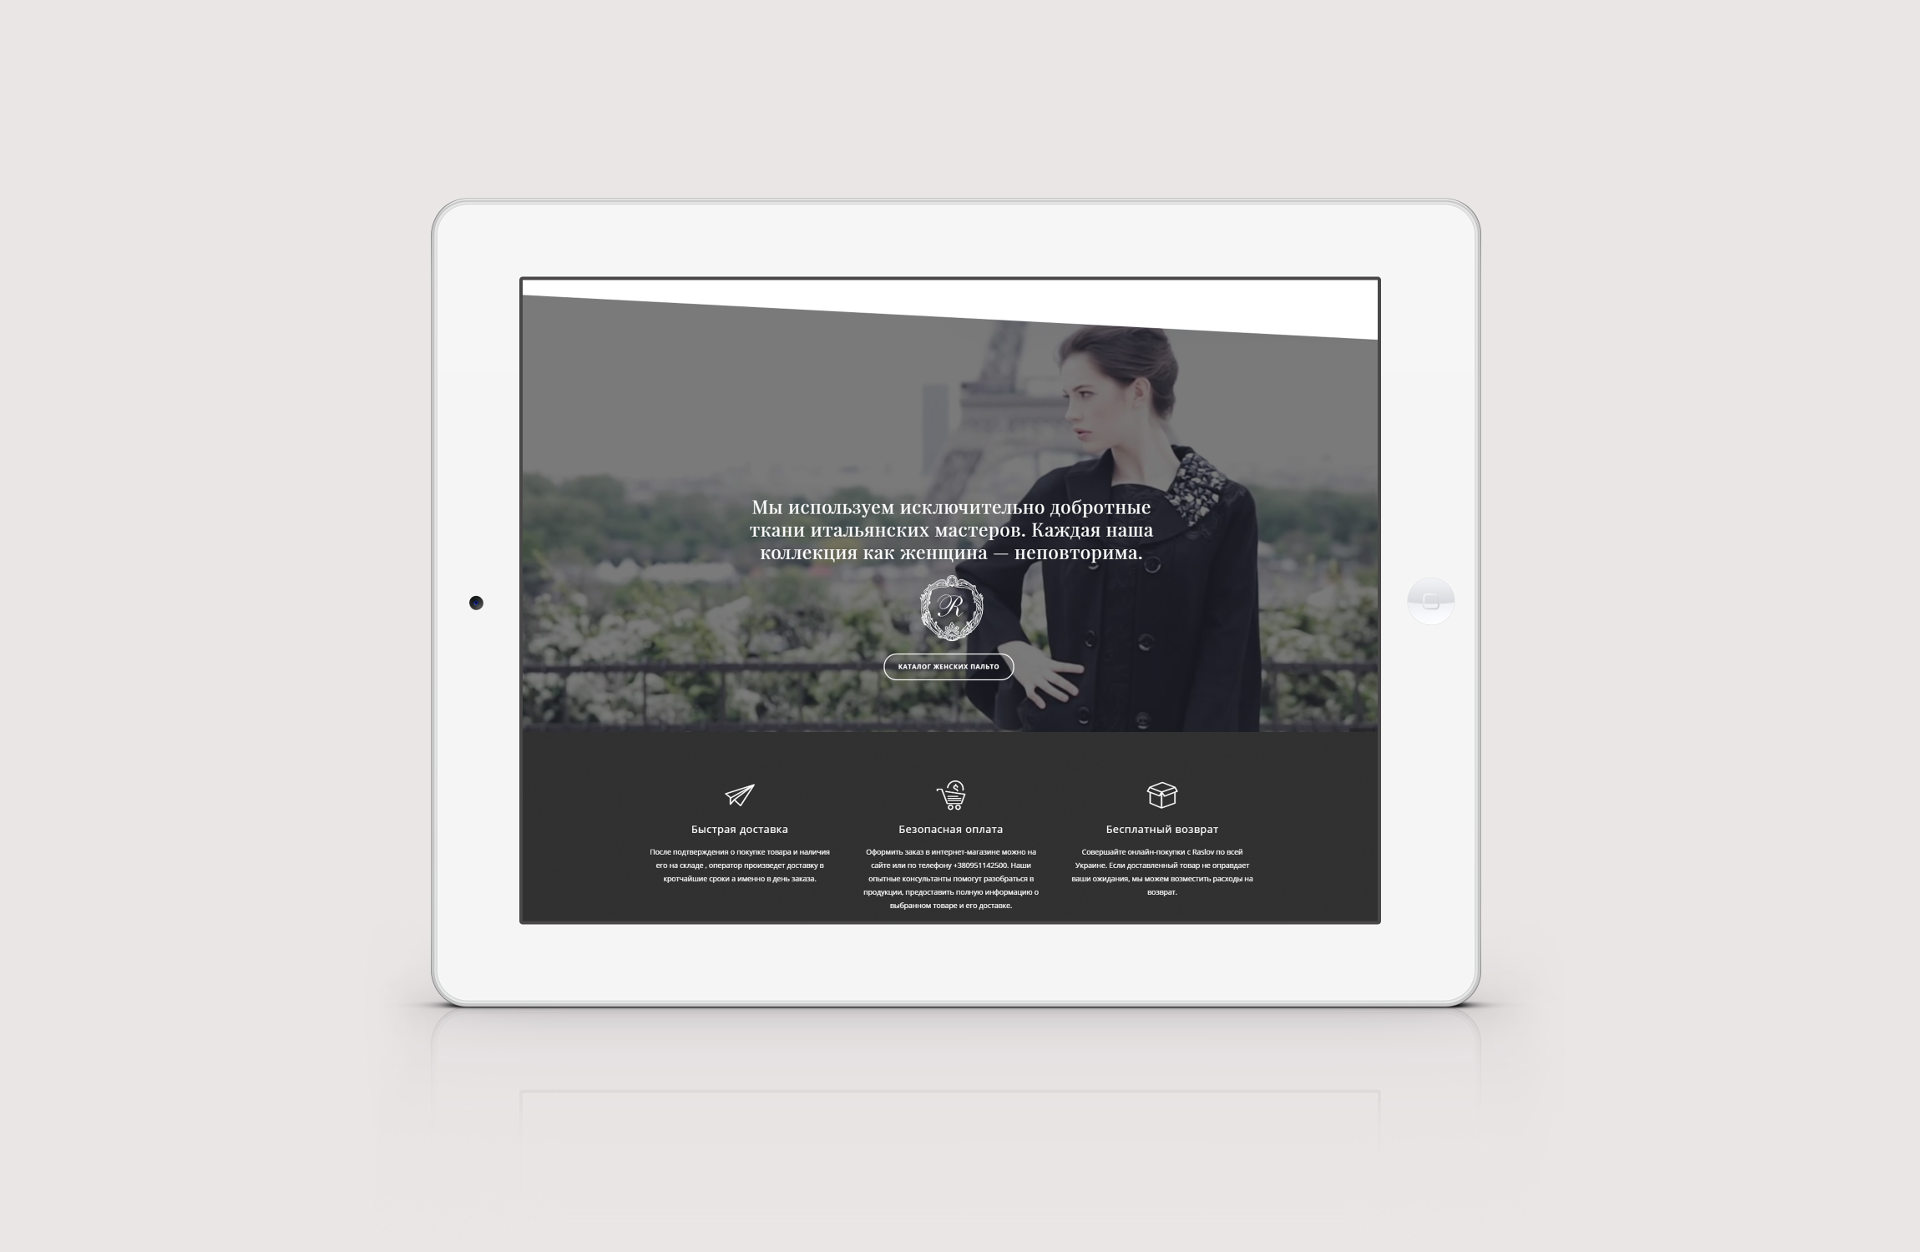 Design of the website для дизайнера clothes